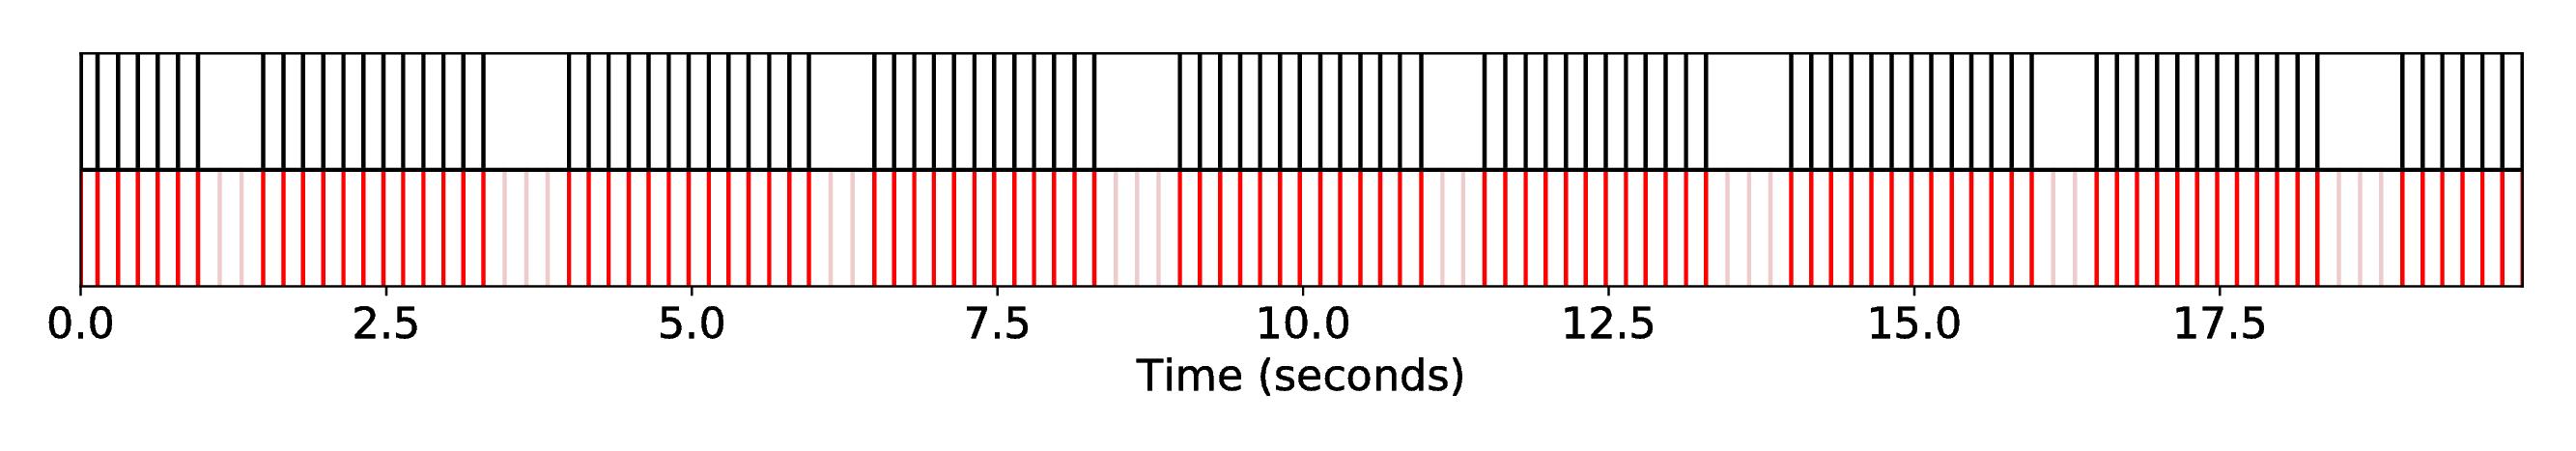 DP1_INT1_R-MRI-24__S-Broke__SequenceAlignment